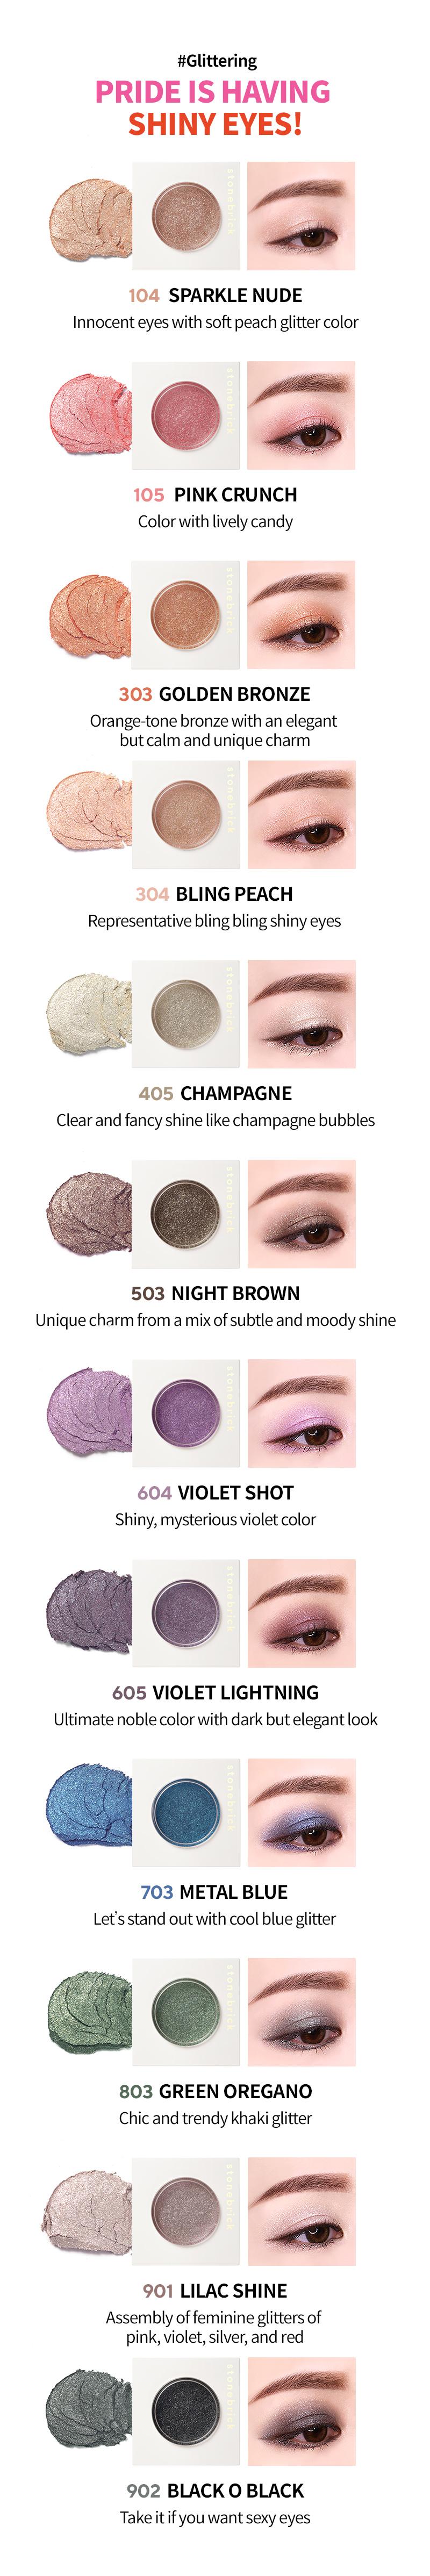 stonebrick-Glitter-Mono-Eye-Shadow-Sticks-10-Colors-1-1g-Product-Description-03